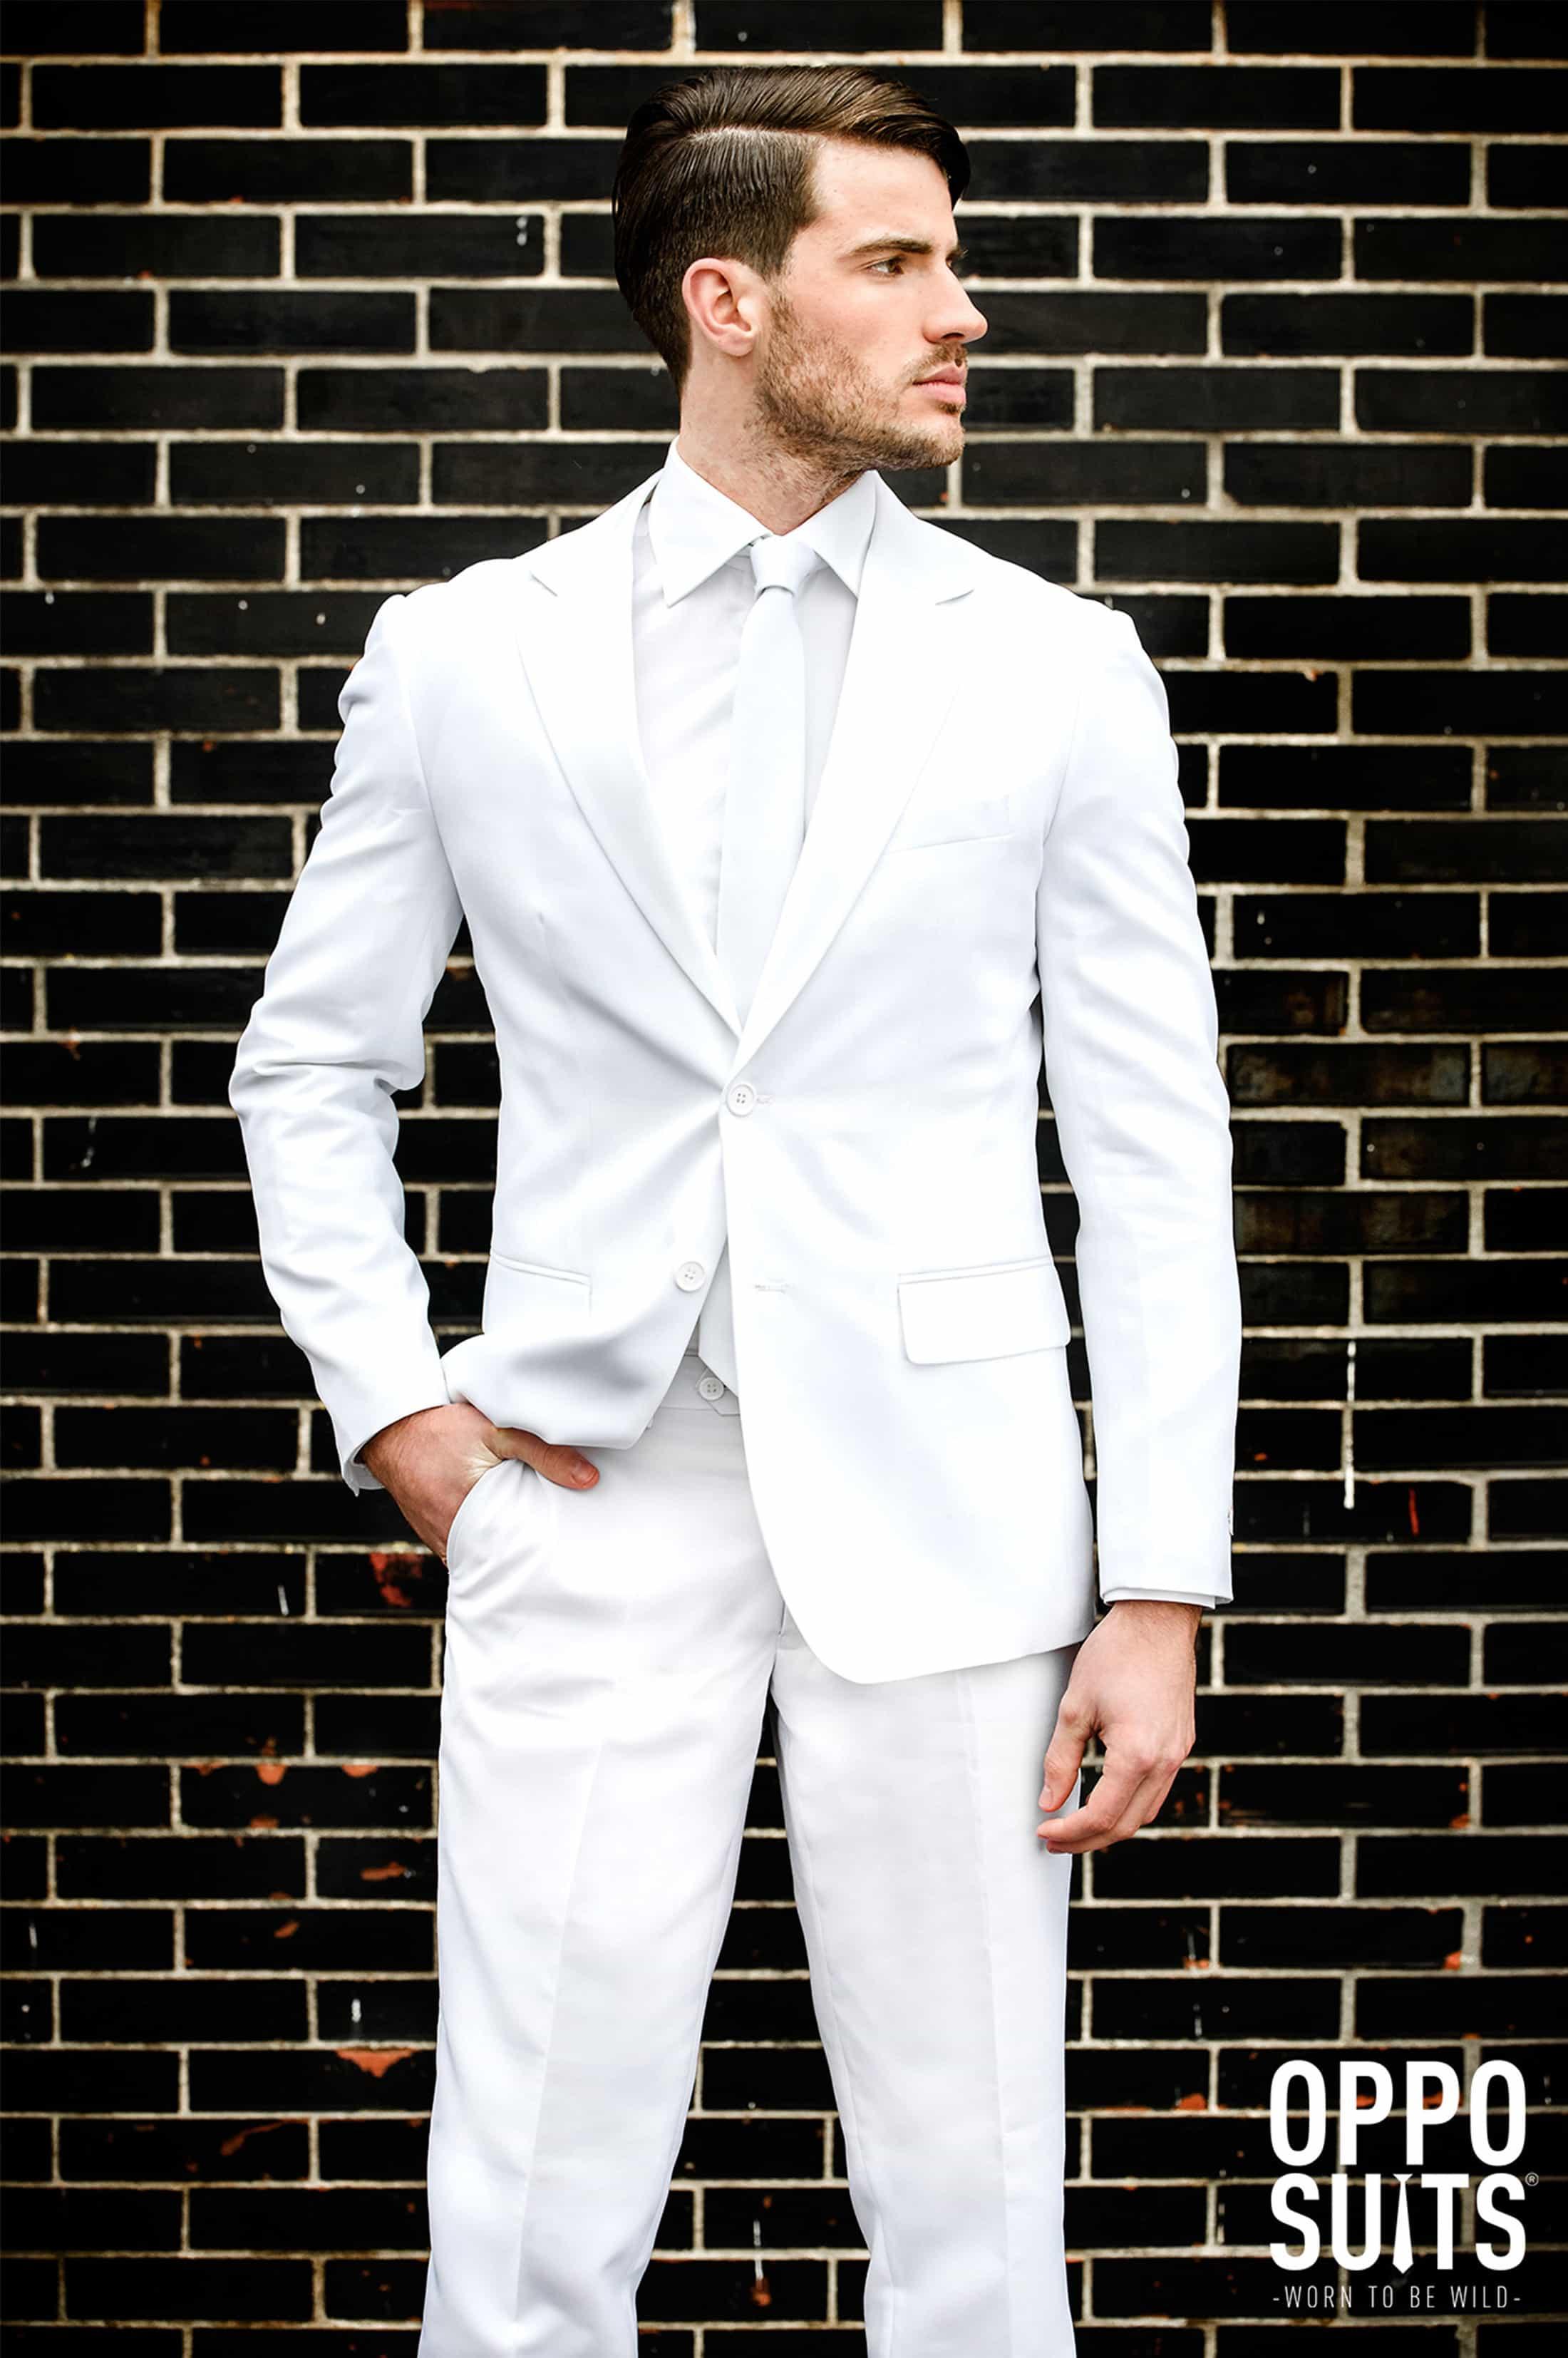 OppoSuits White Knight Anzug foto 2